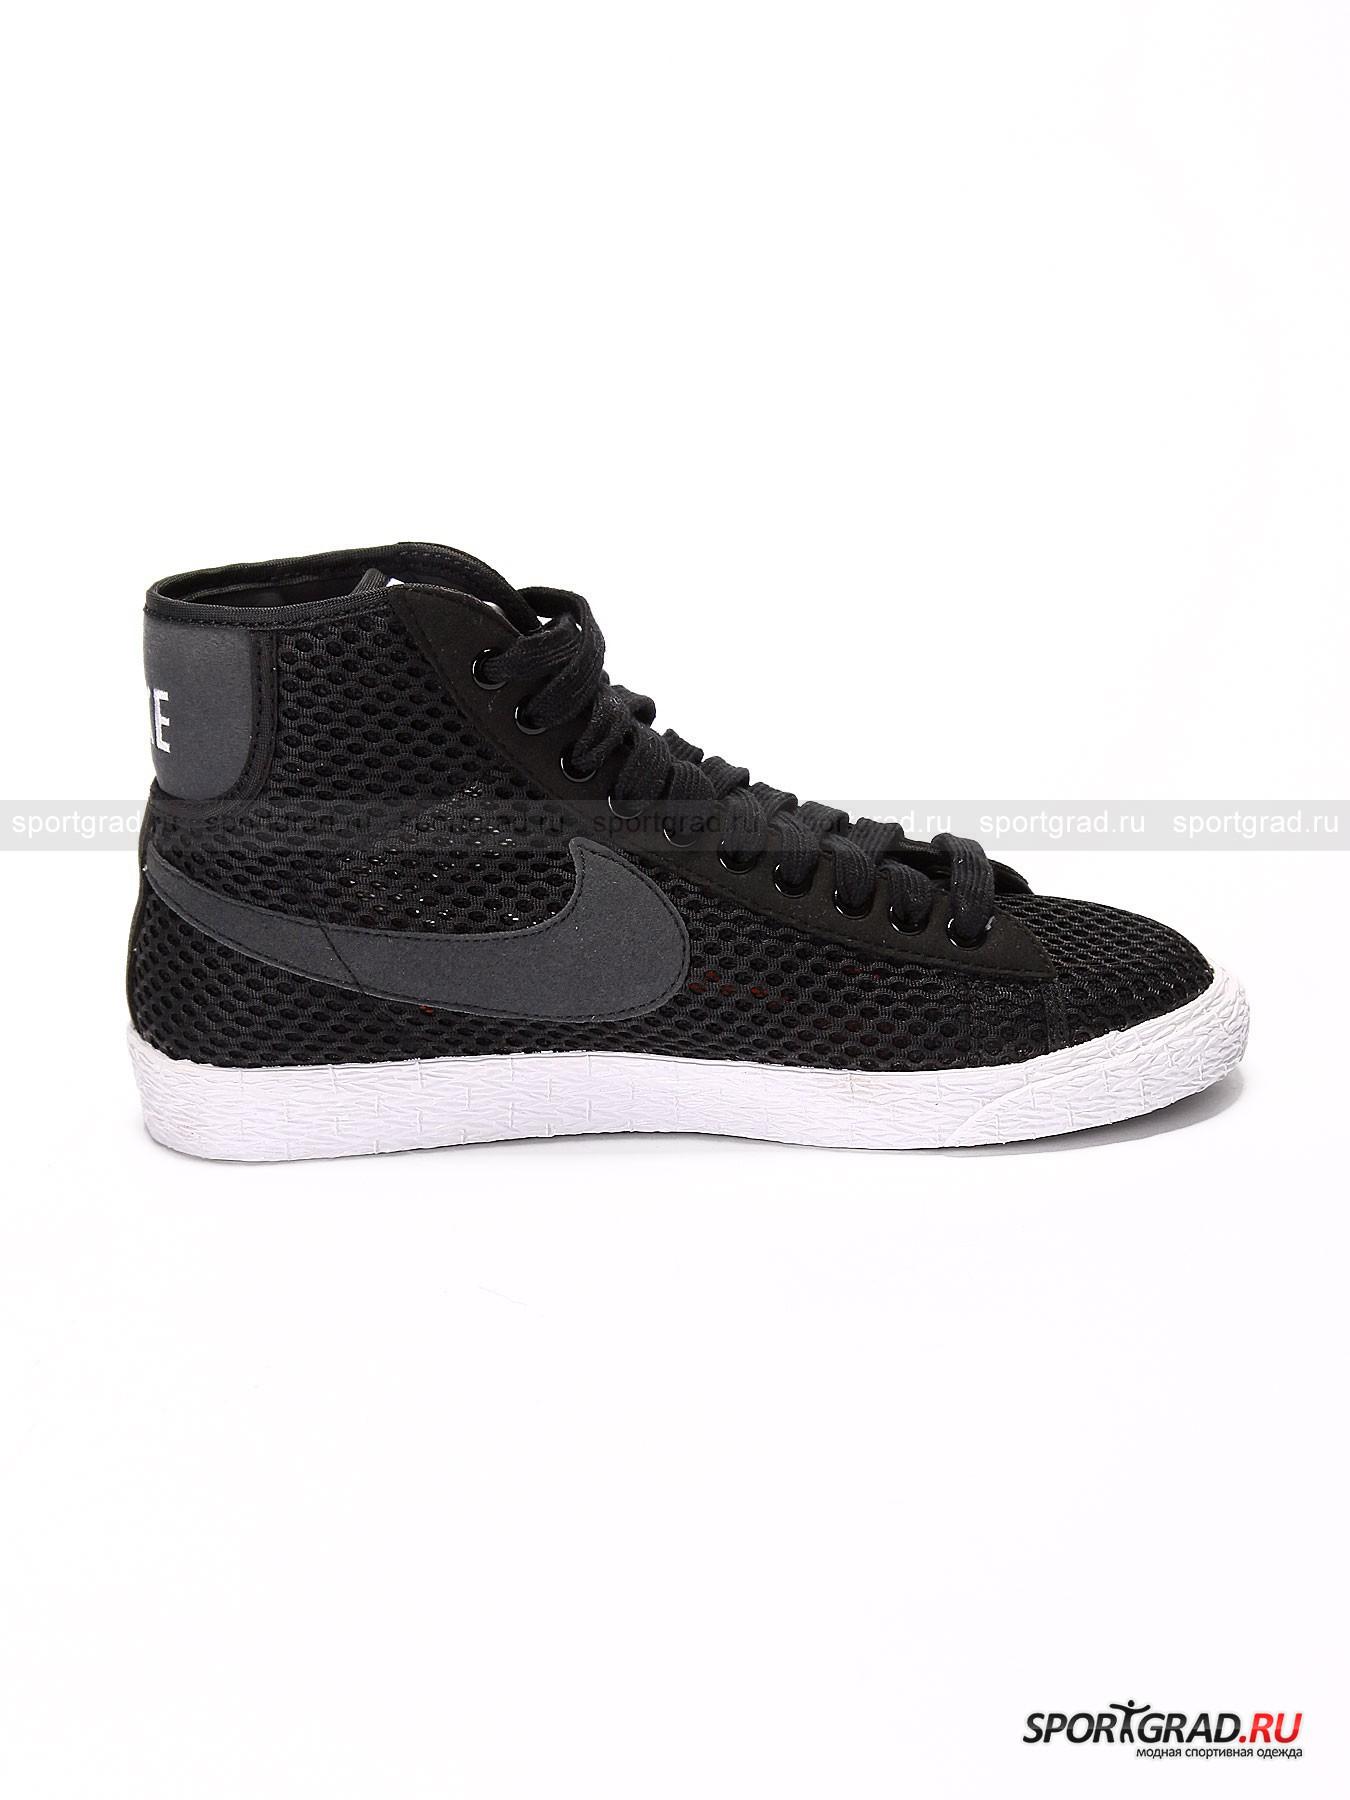 Кроссовки женские Nike BLAZER MID MESH от Спортград